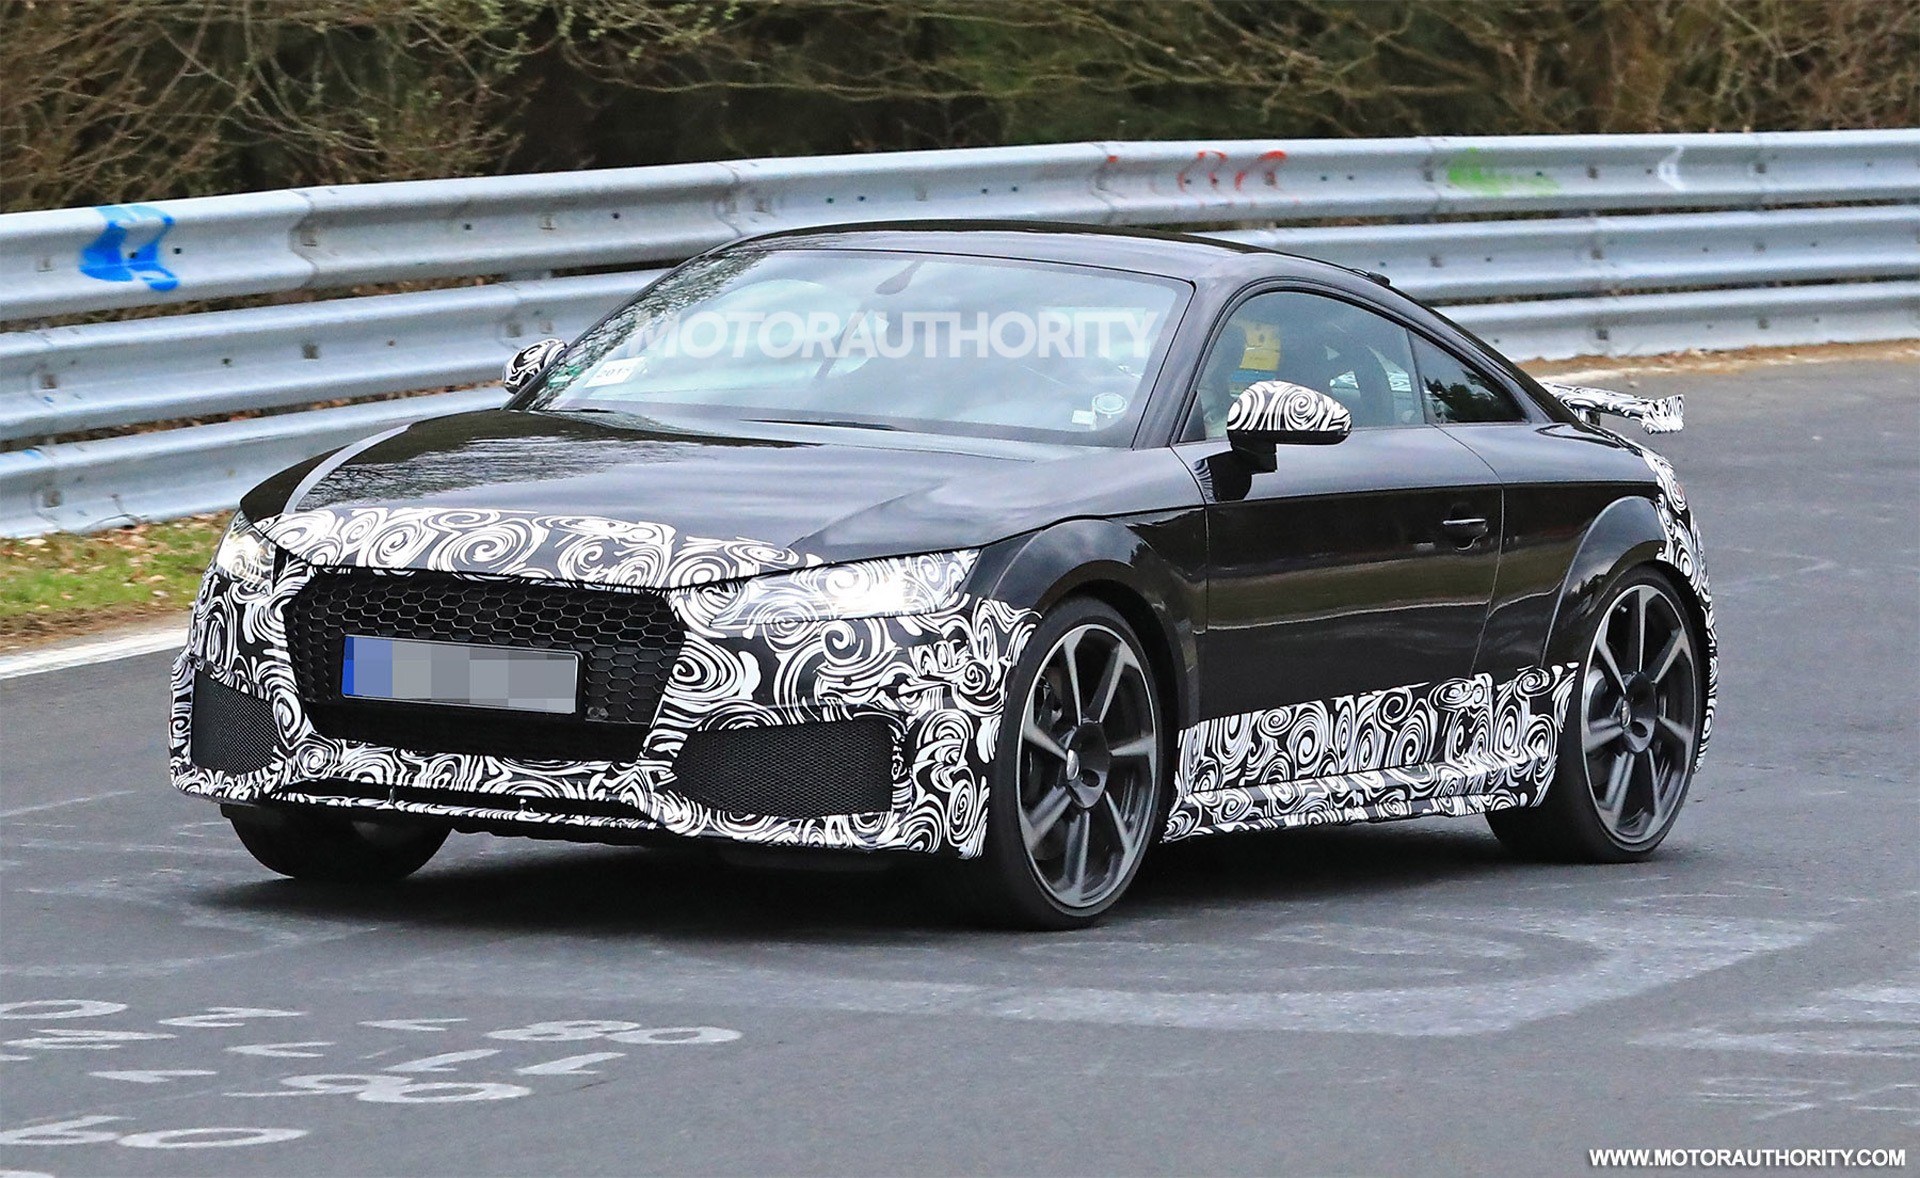 2020 Audi TT RS spy shots and video